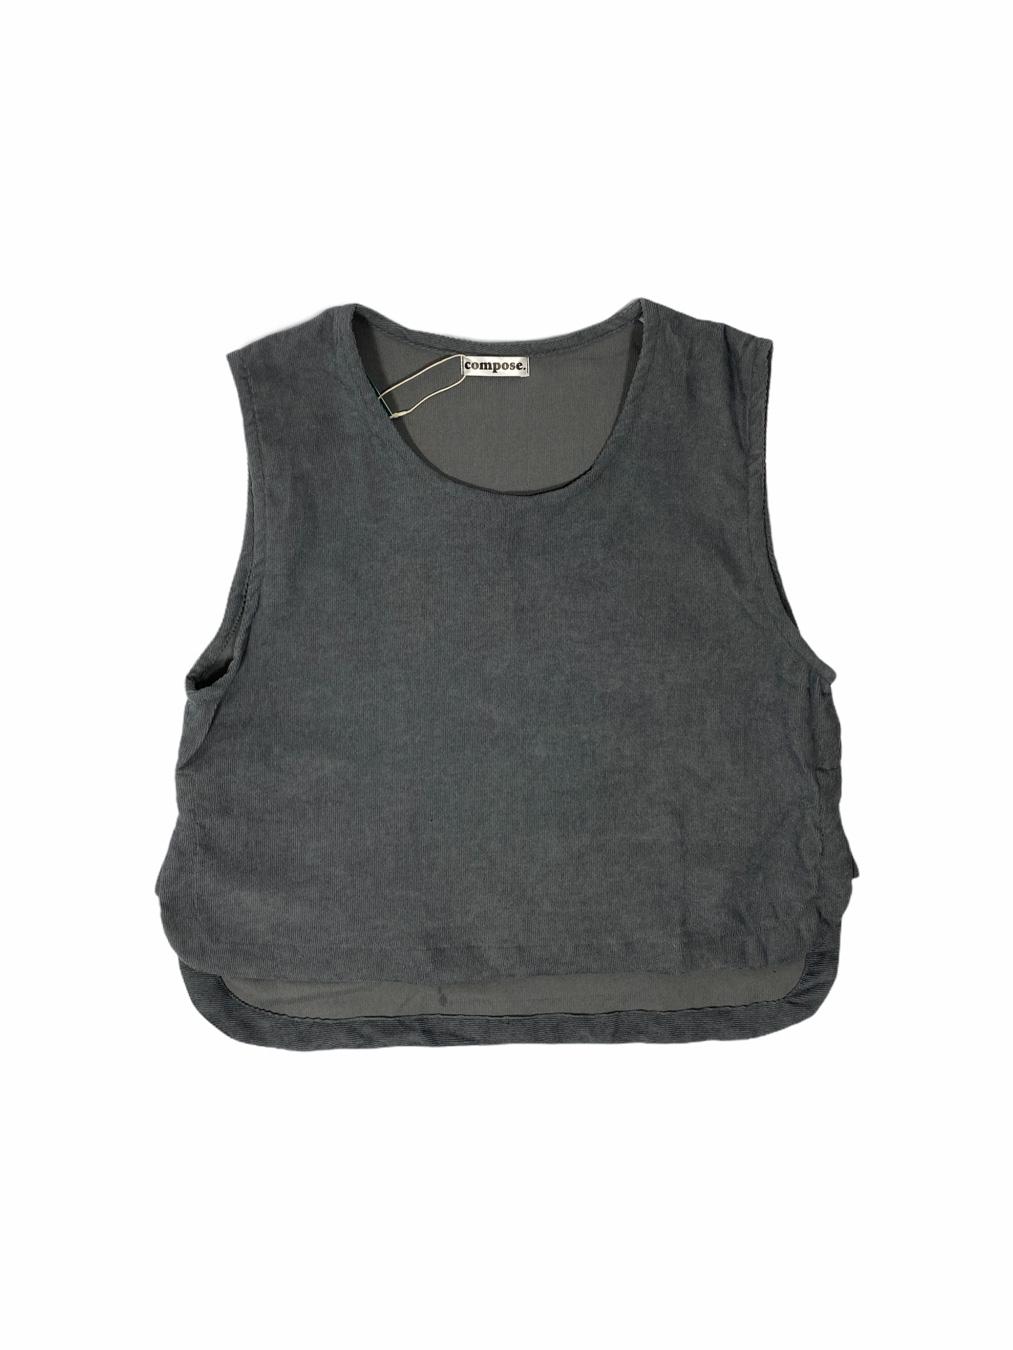 C/C Vest (Dark Grey)